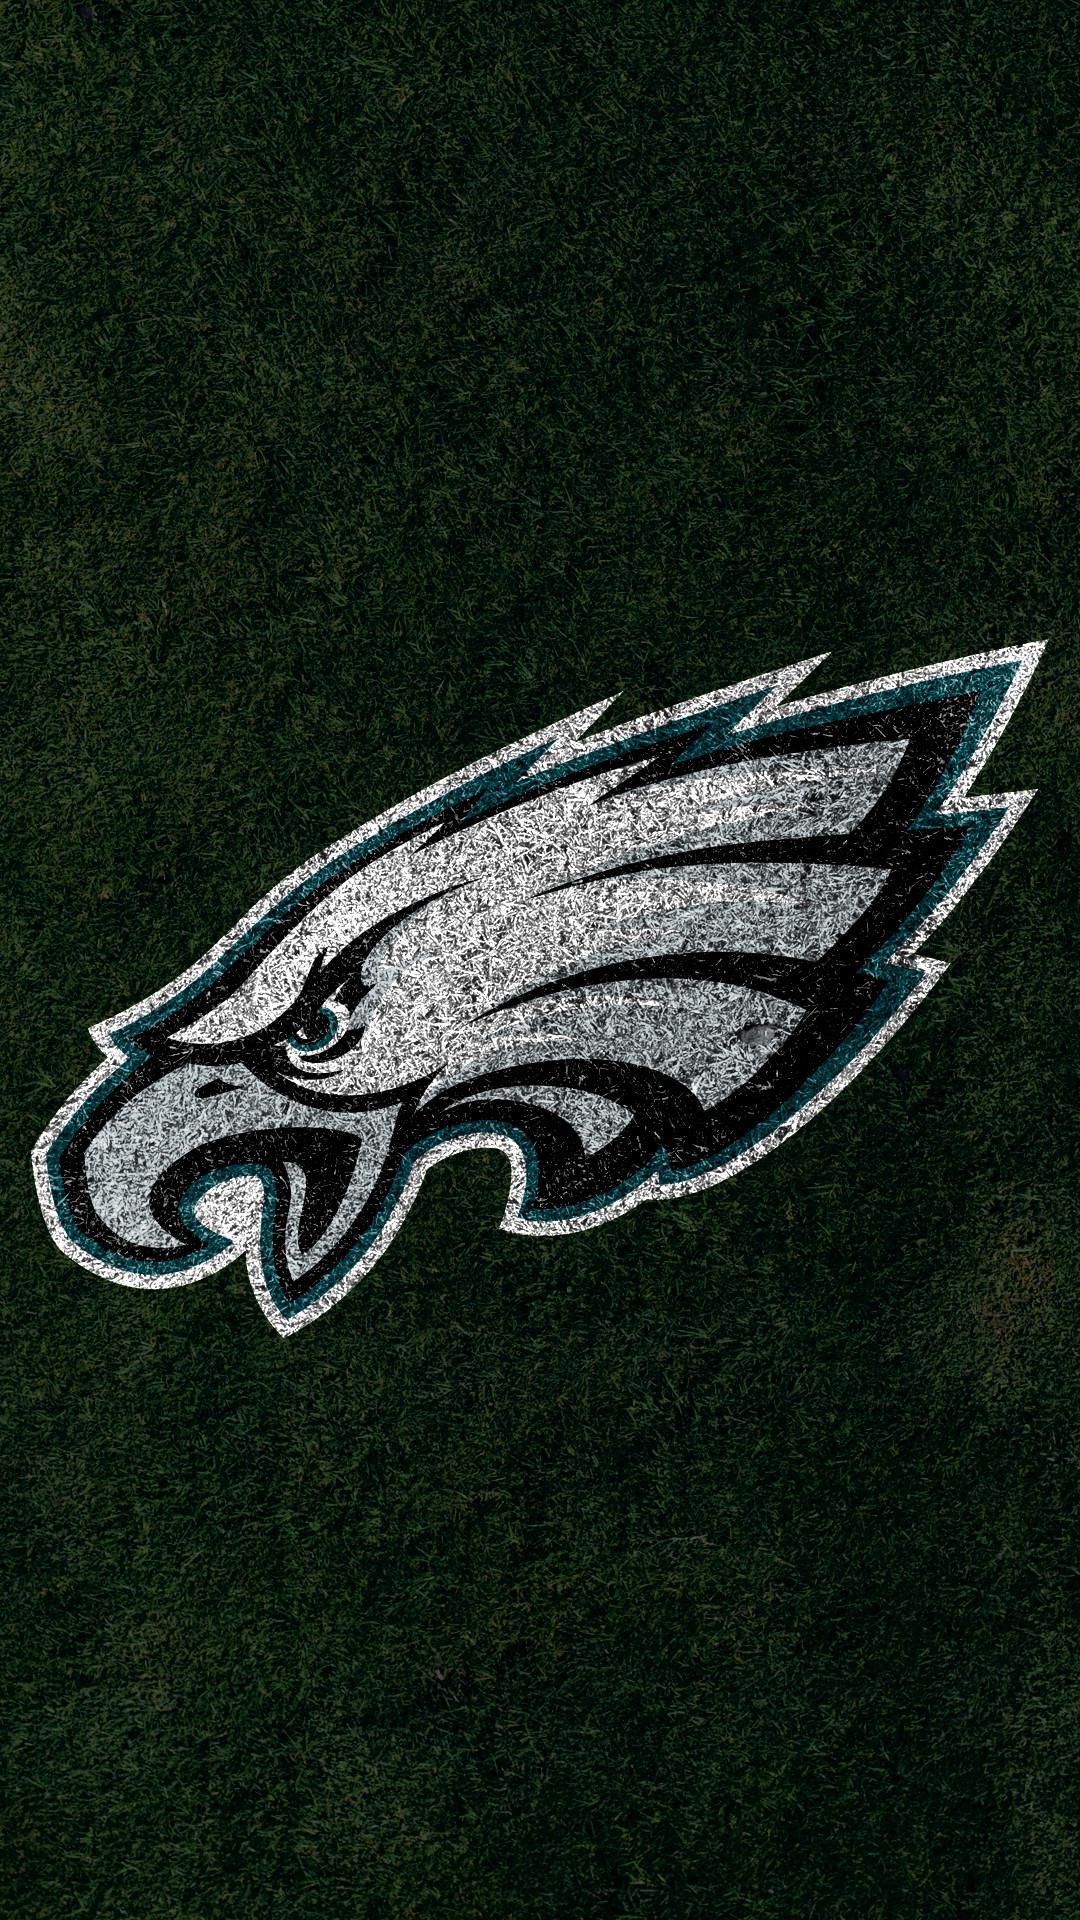 Best 25+ Philadelphia eagles wallpaper ideas on Pinterest   Philadelphia  eagles football, Eagles philly and Philadelphia eagles